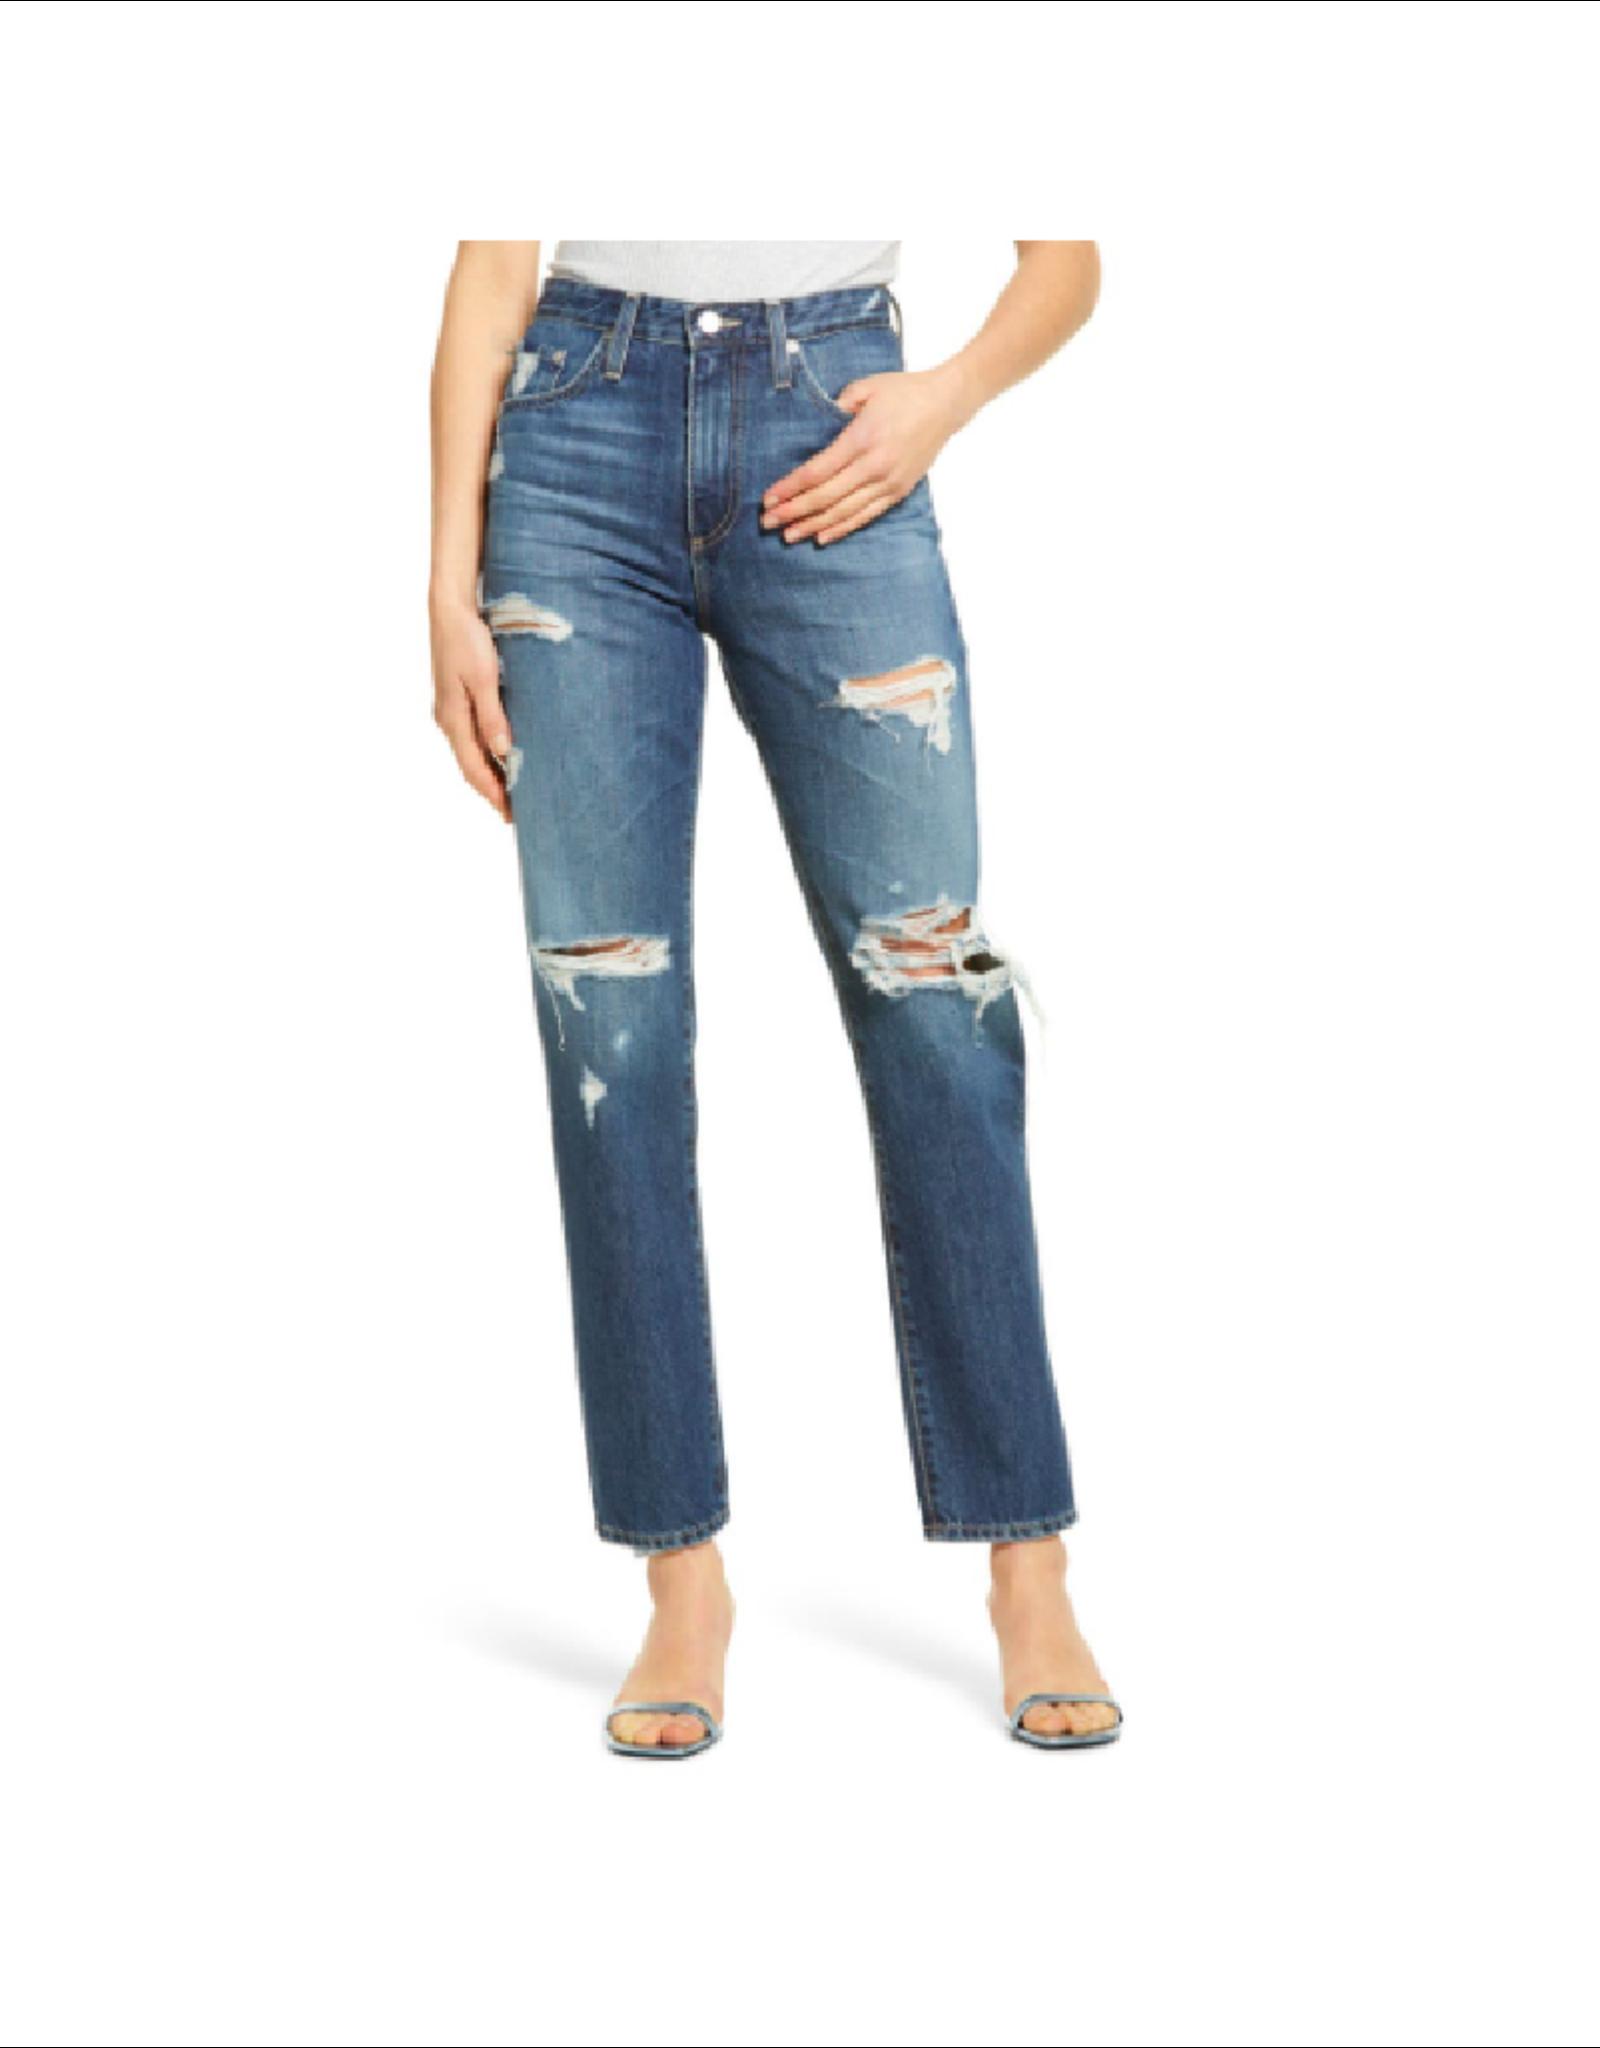 AG Jeans Phoebe 8 Years Bracewall